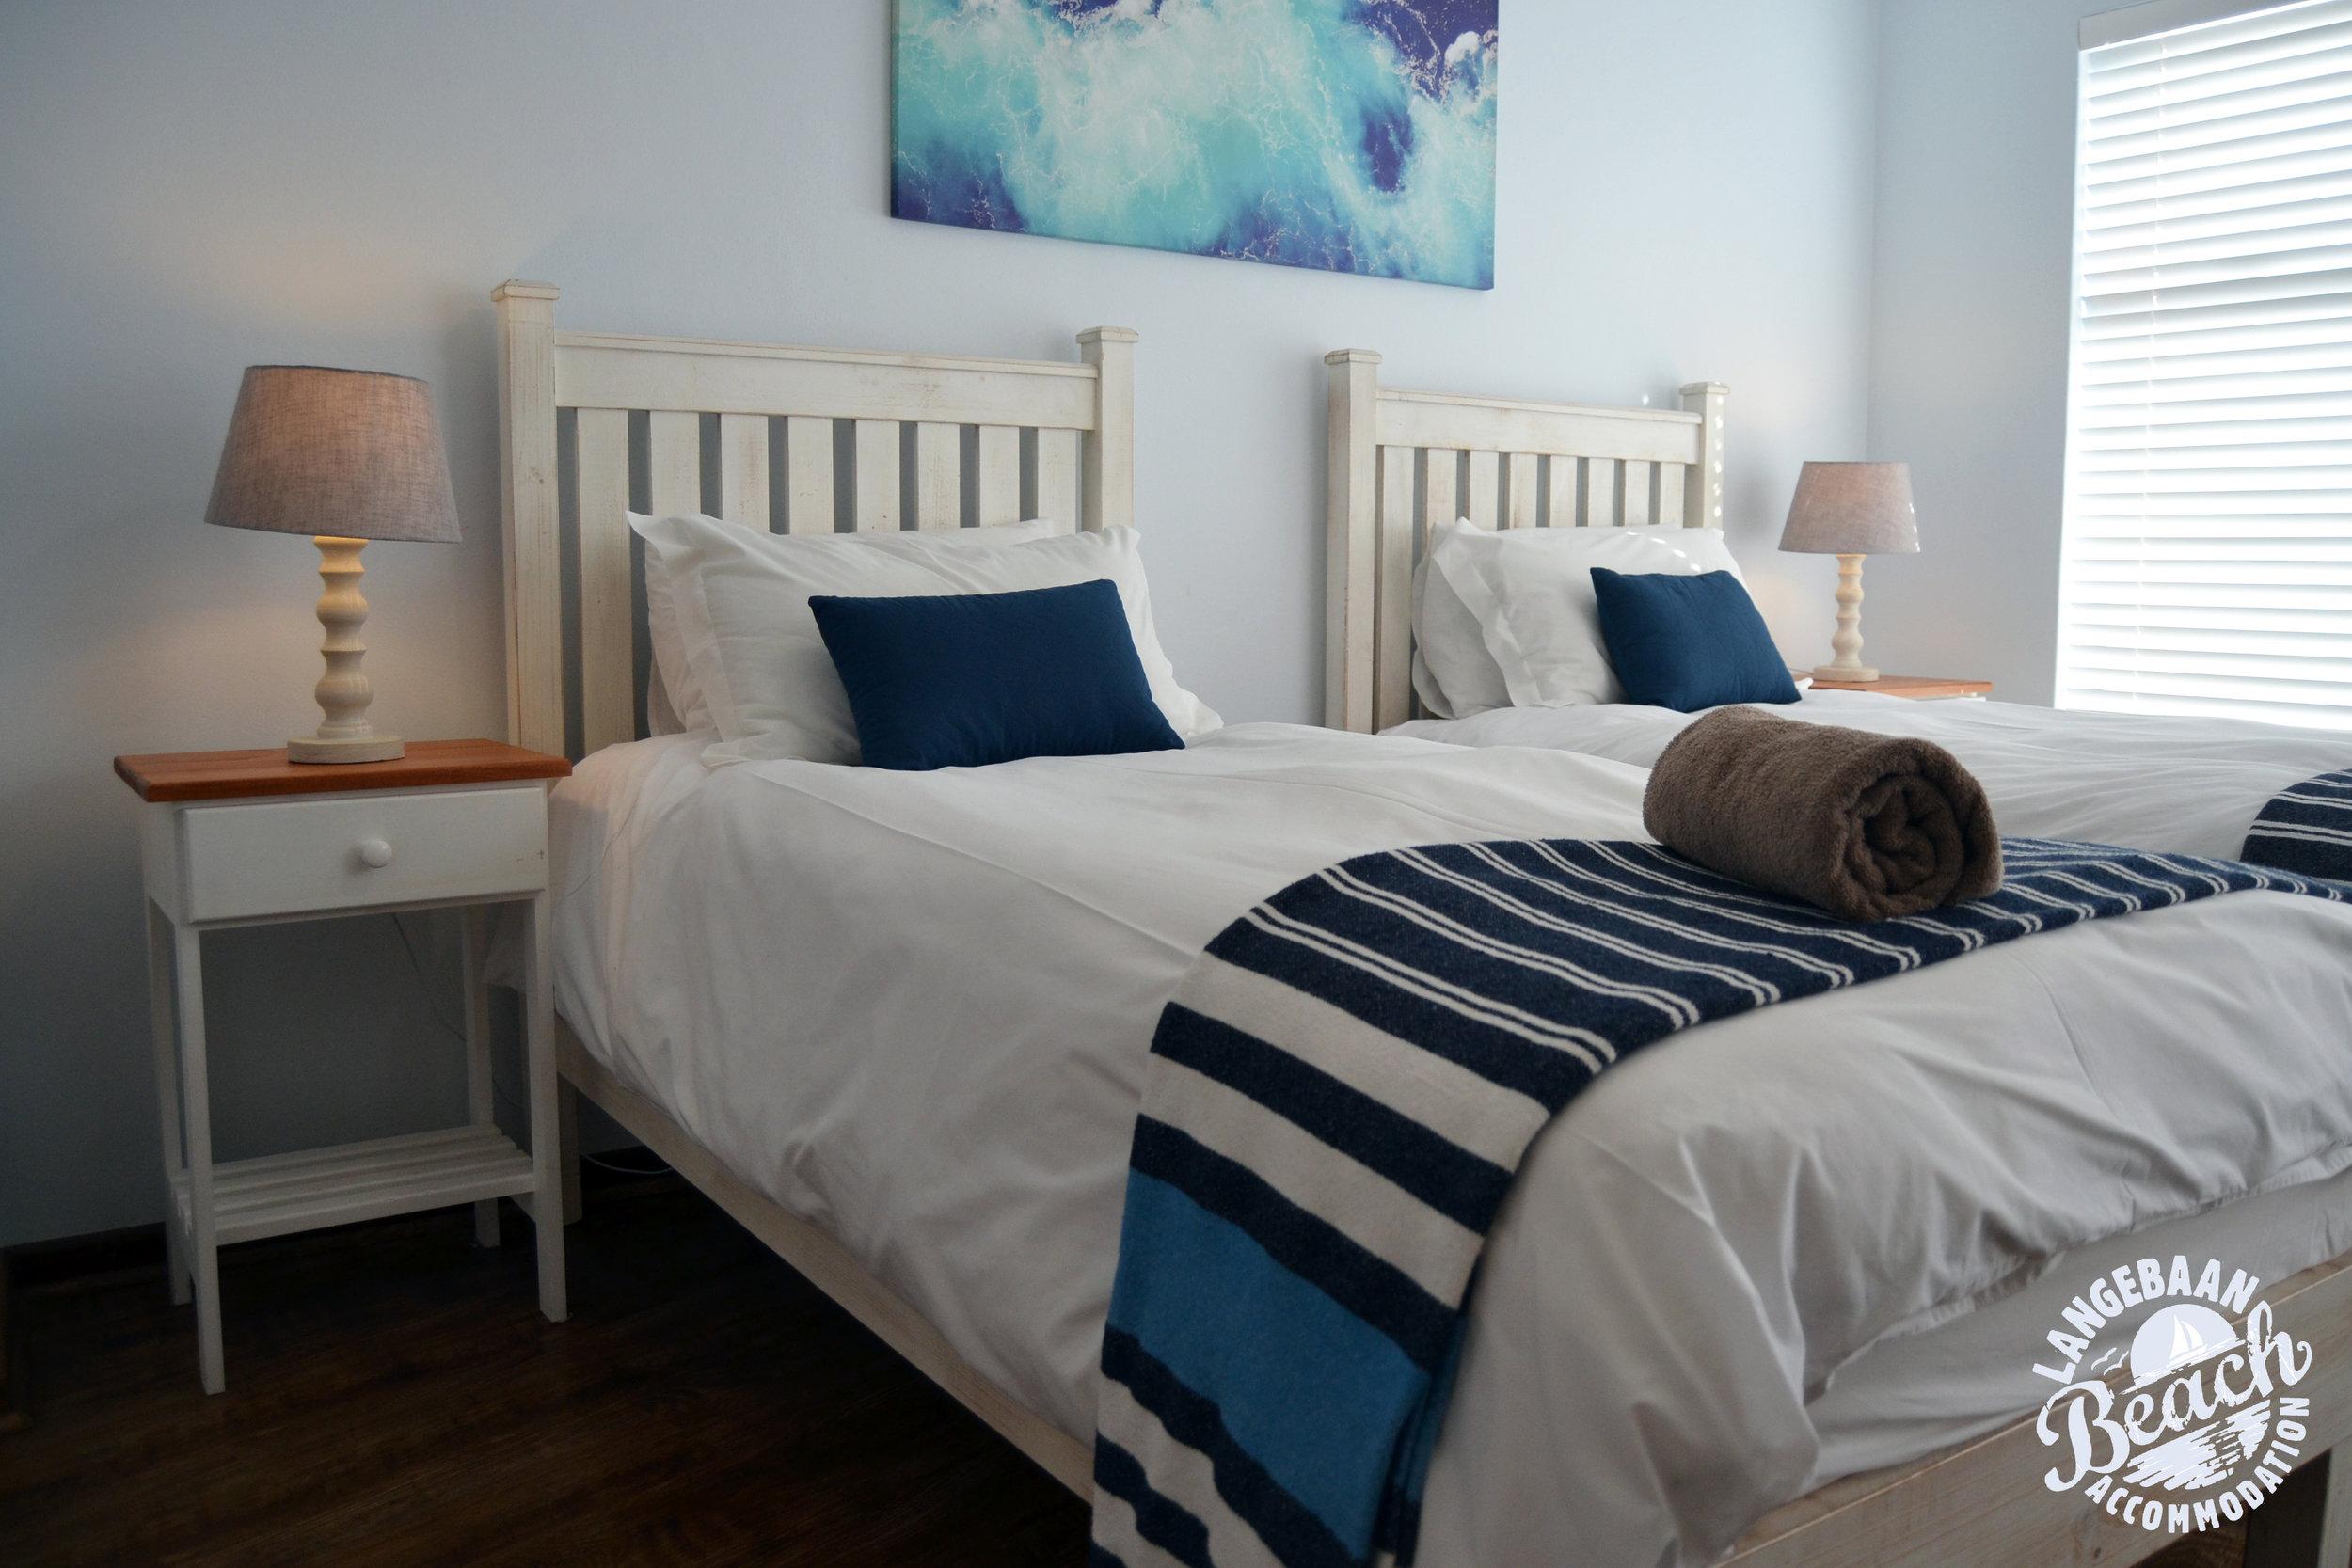 bed 3 (1).JPG